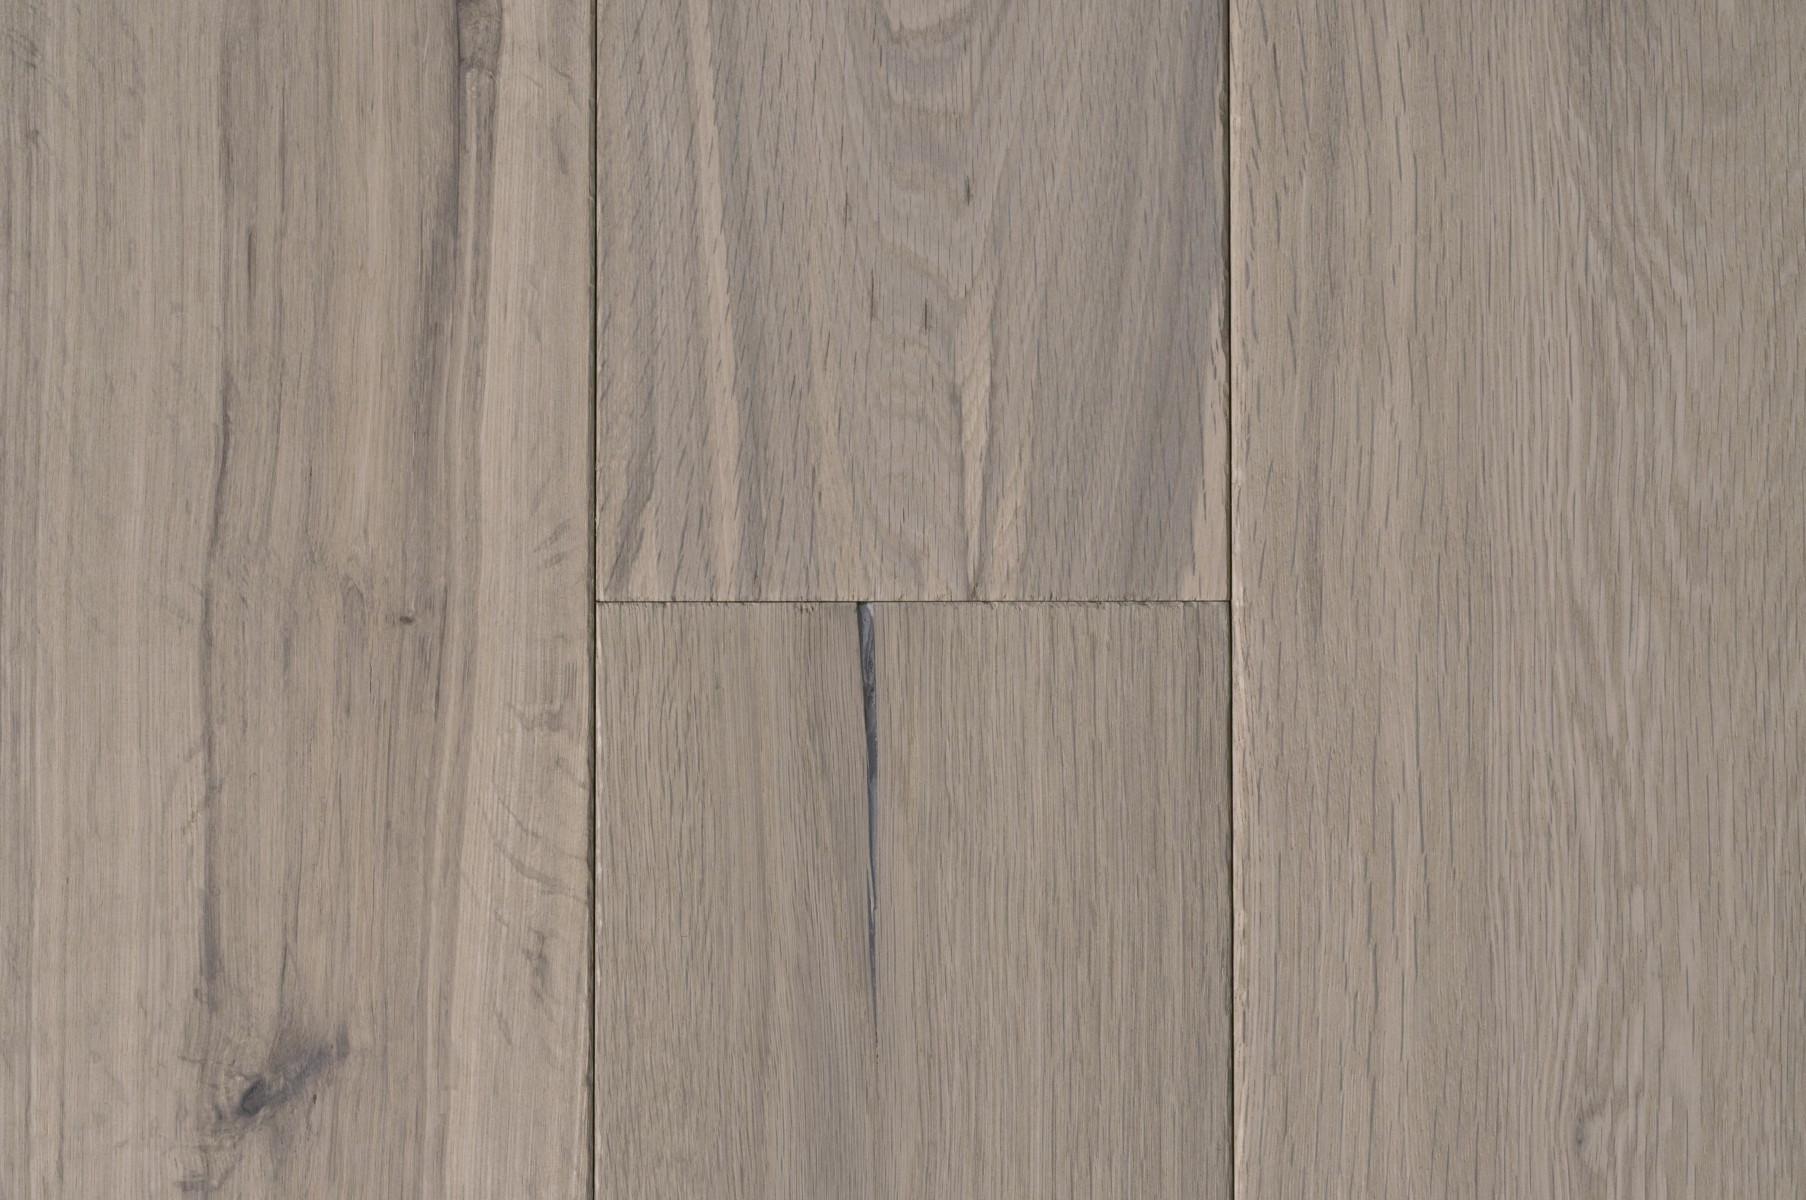 5 8 engineered hardwood flooring of duchateau hardwood flooring houston tx discount engineered wood inside antique white european oak width 7 44 thickness 5 8 engineered